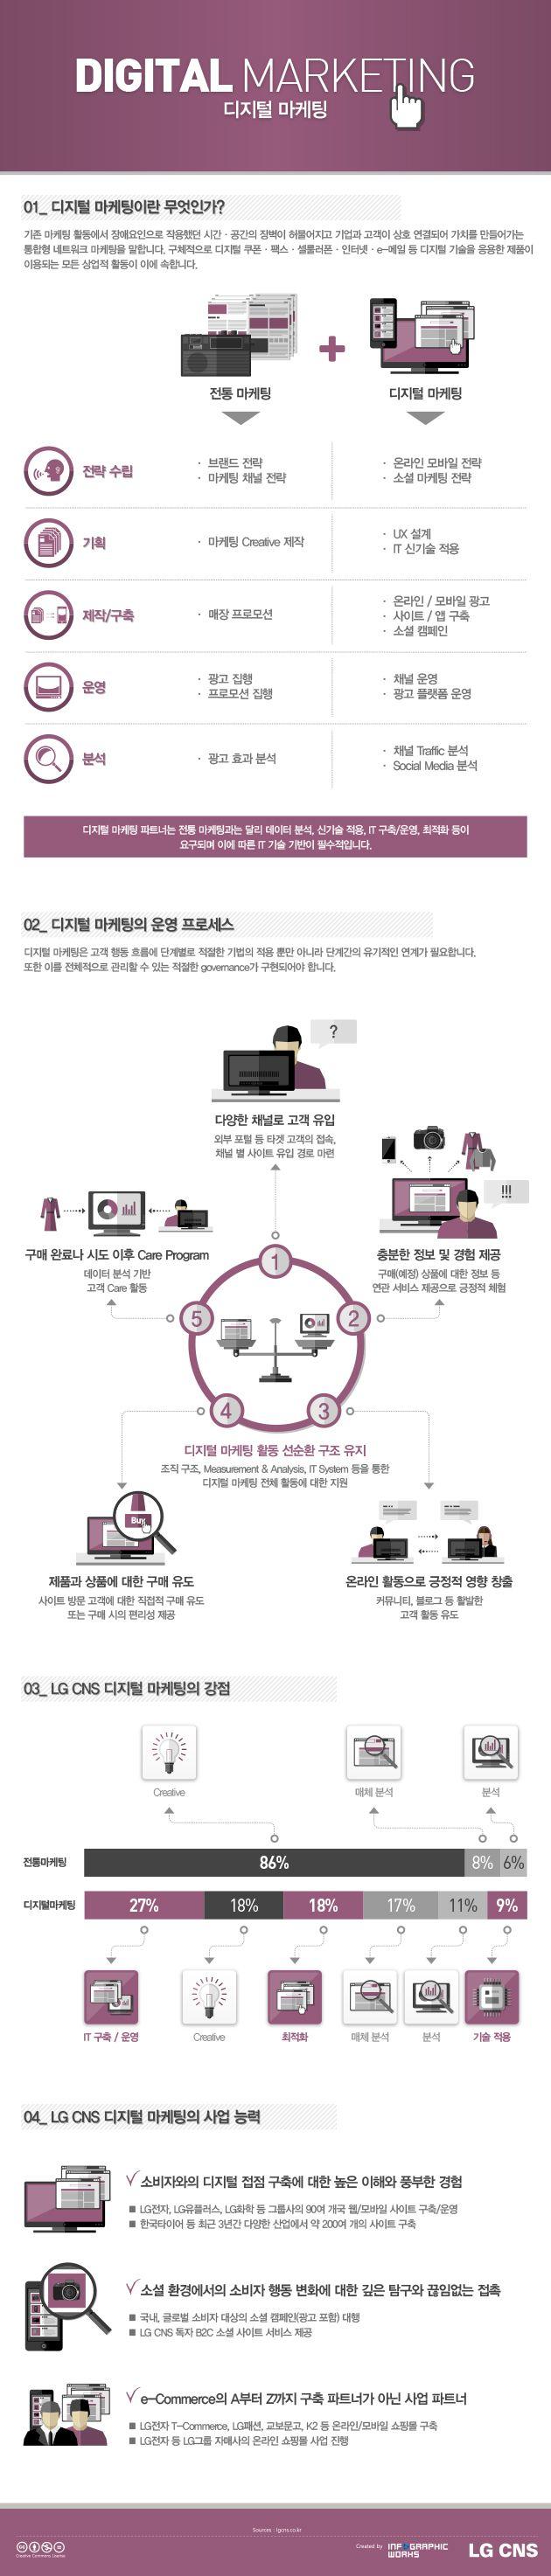 [Infographic] 디지털 마케팅에 관한 인포그래픽